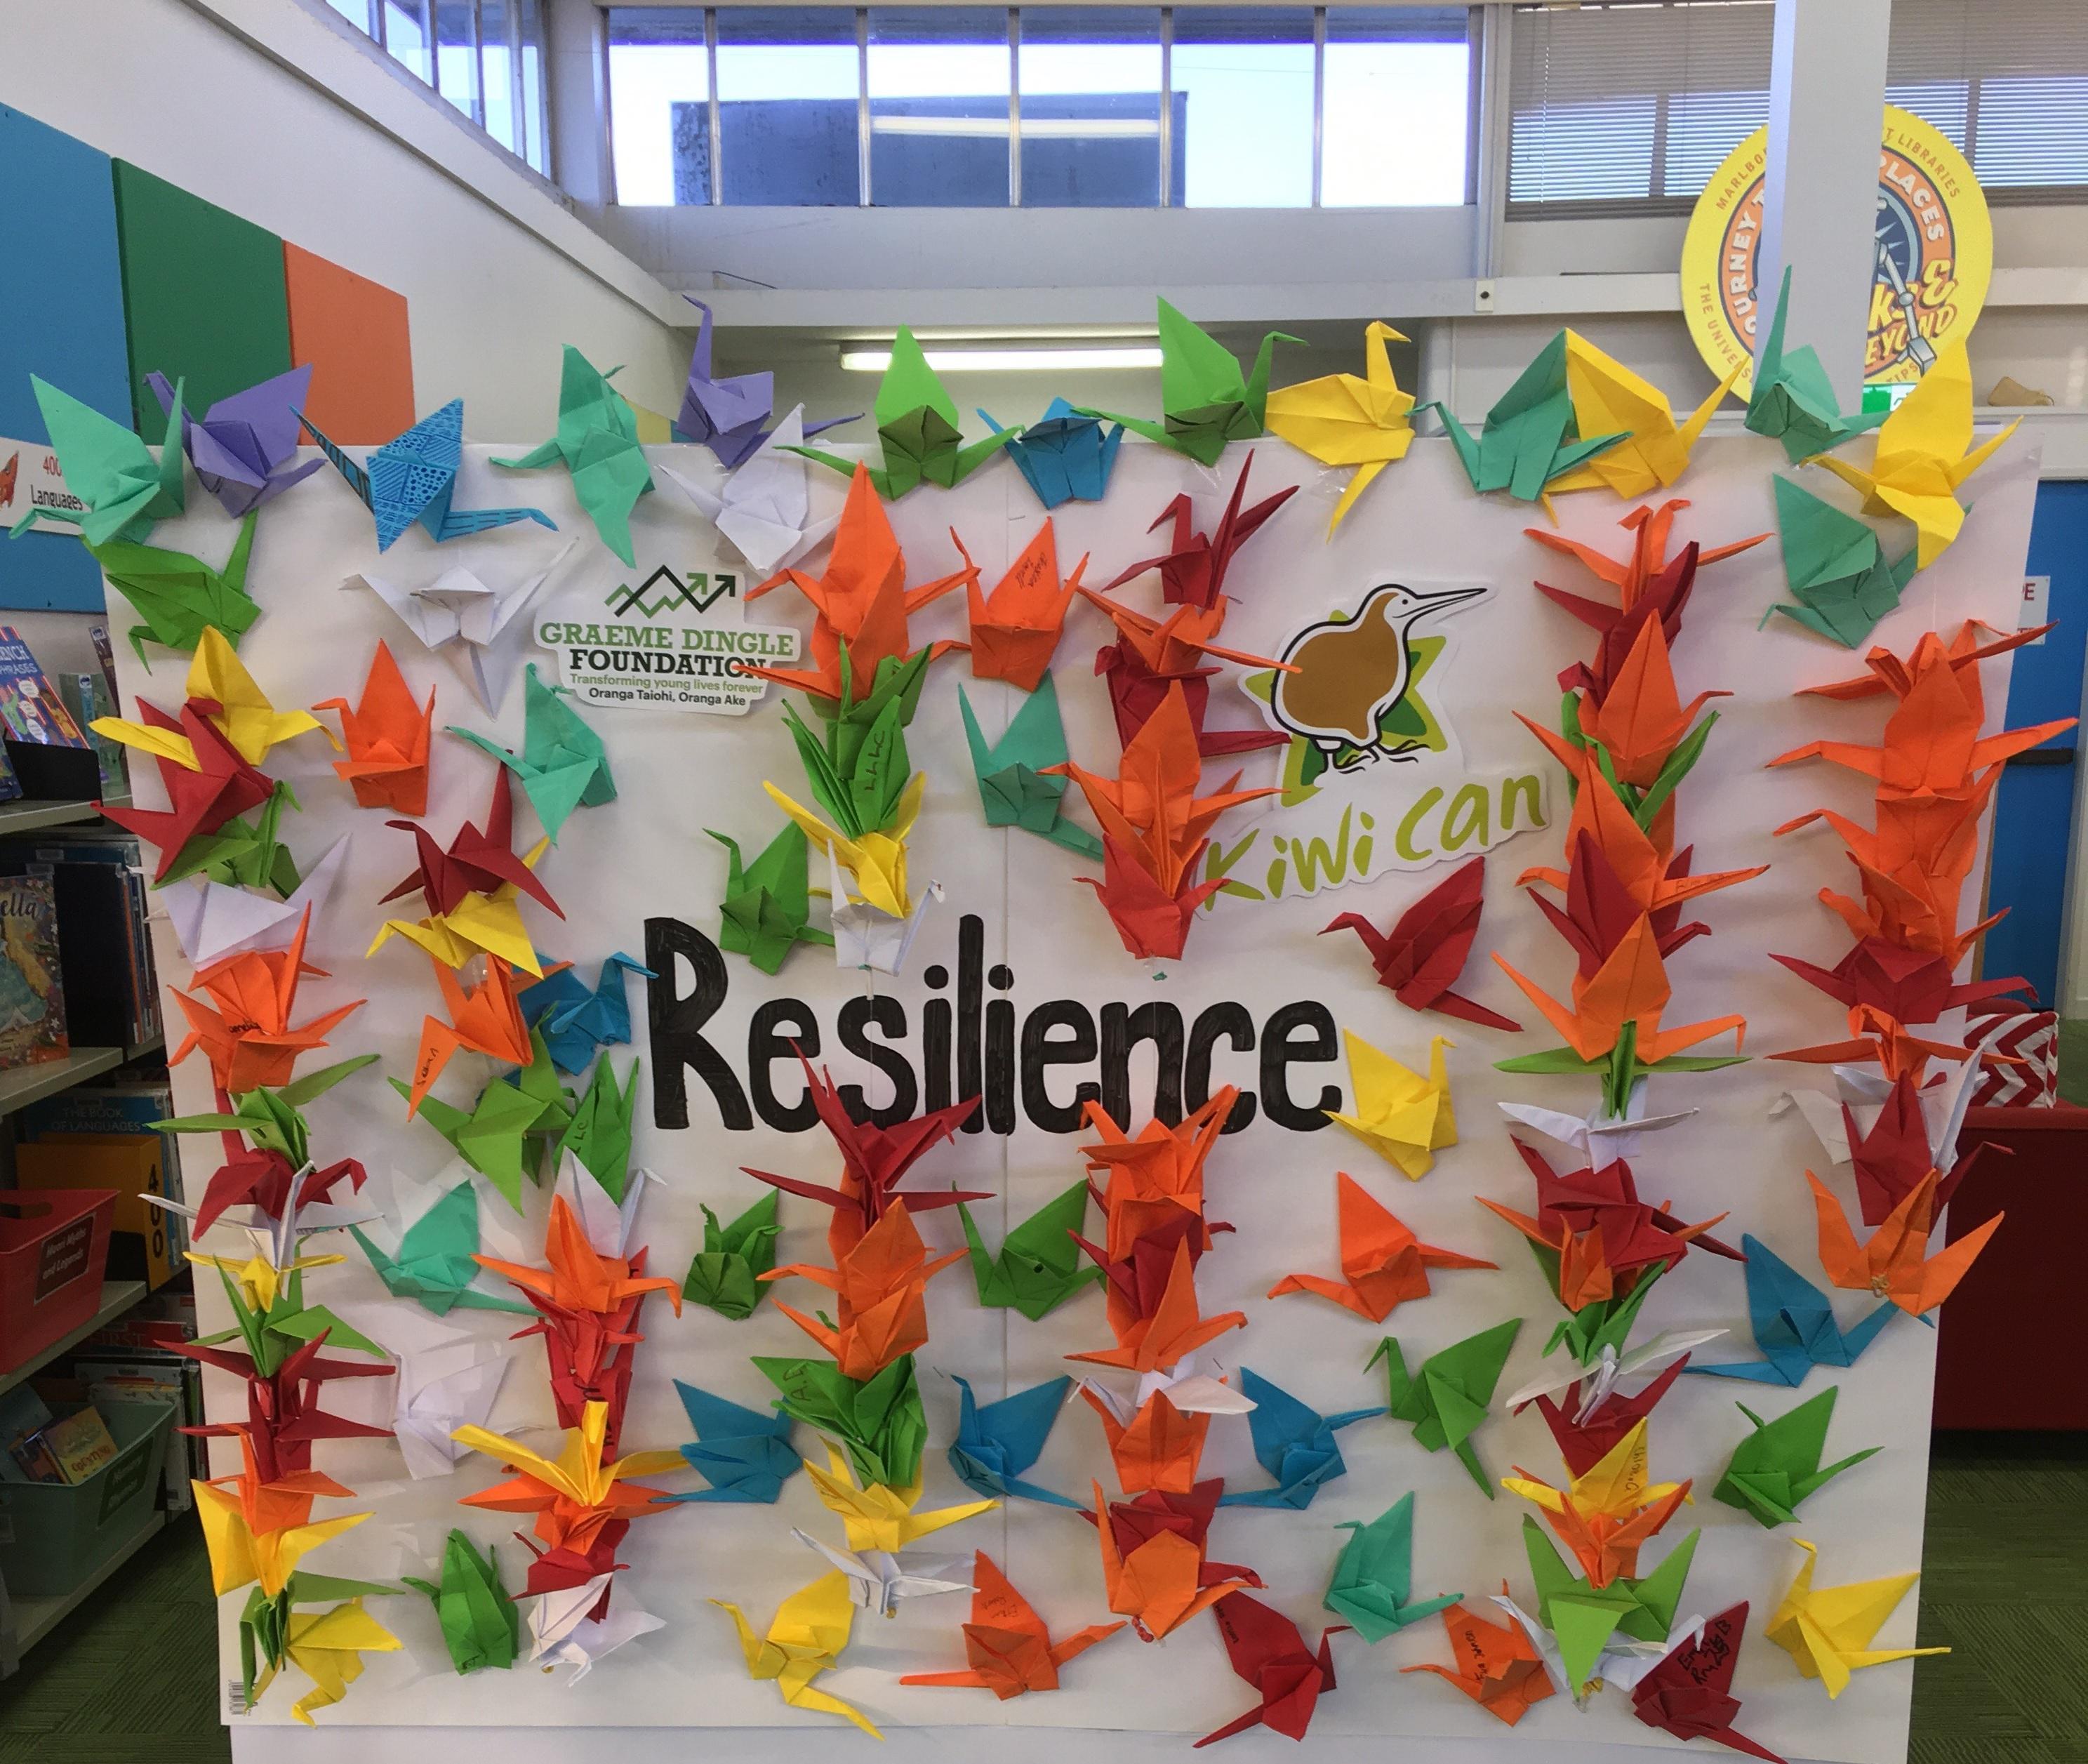 Resilience Display, Blenheim Library, June 2019